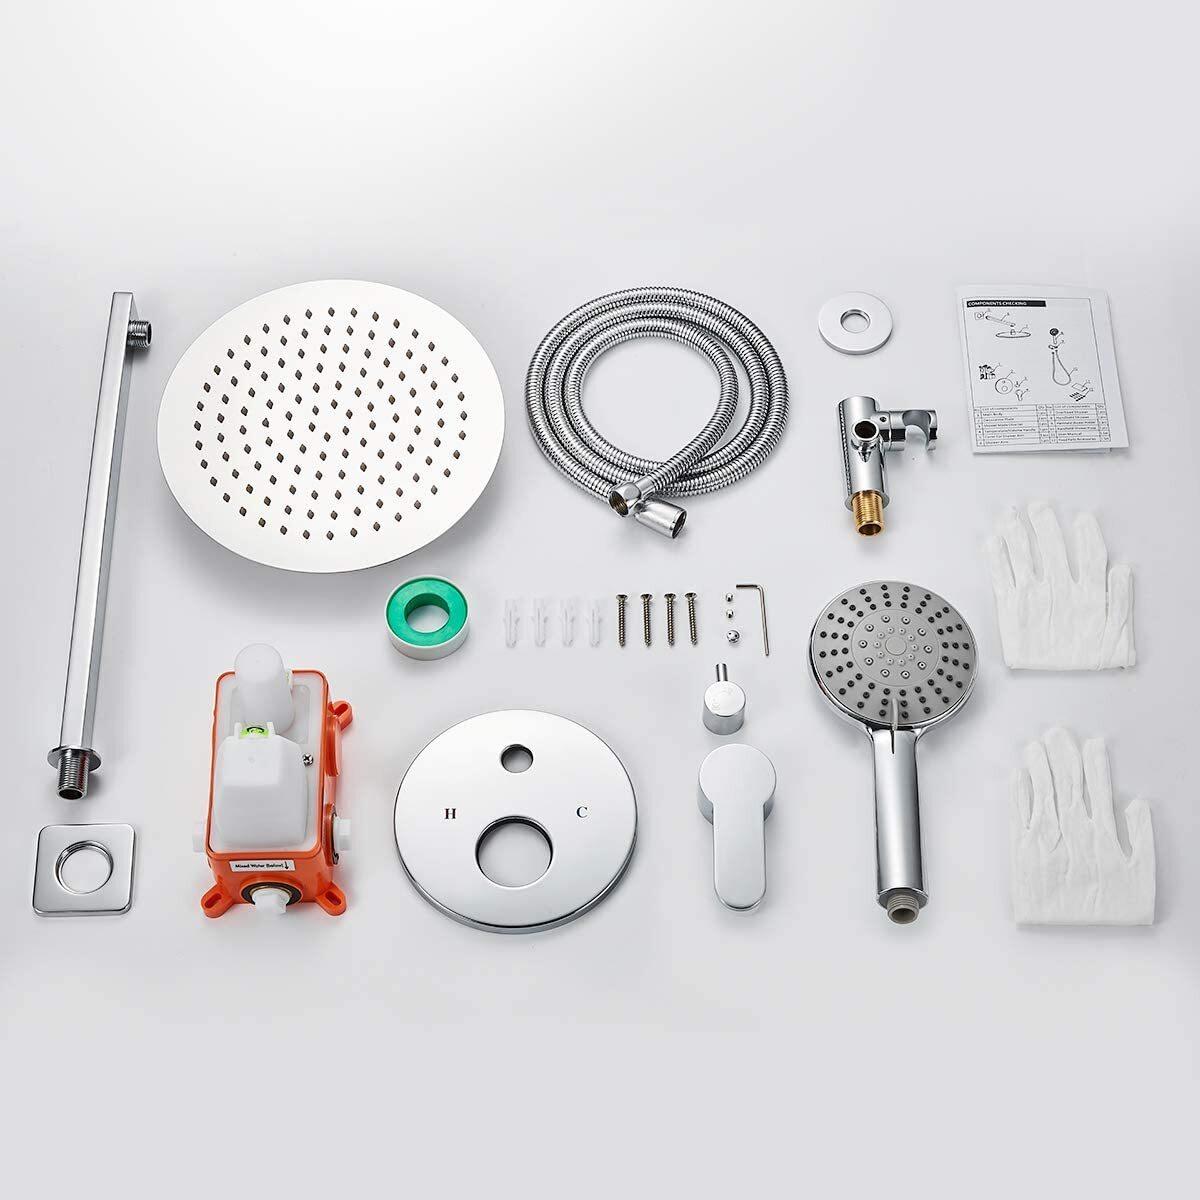 Bathroom Shower Faucet Sytstem, Rainfall Mixer Shower Combo Set ...